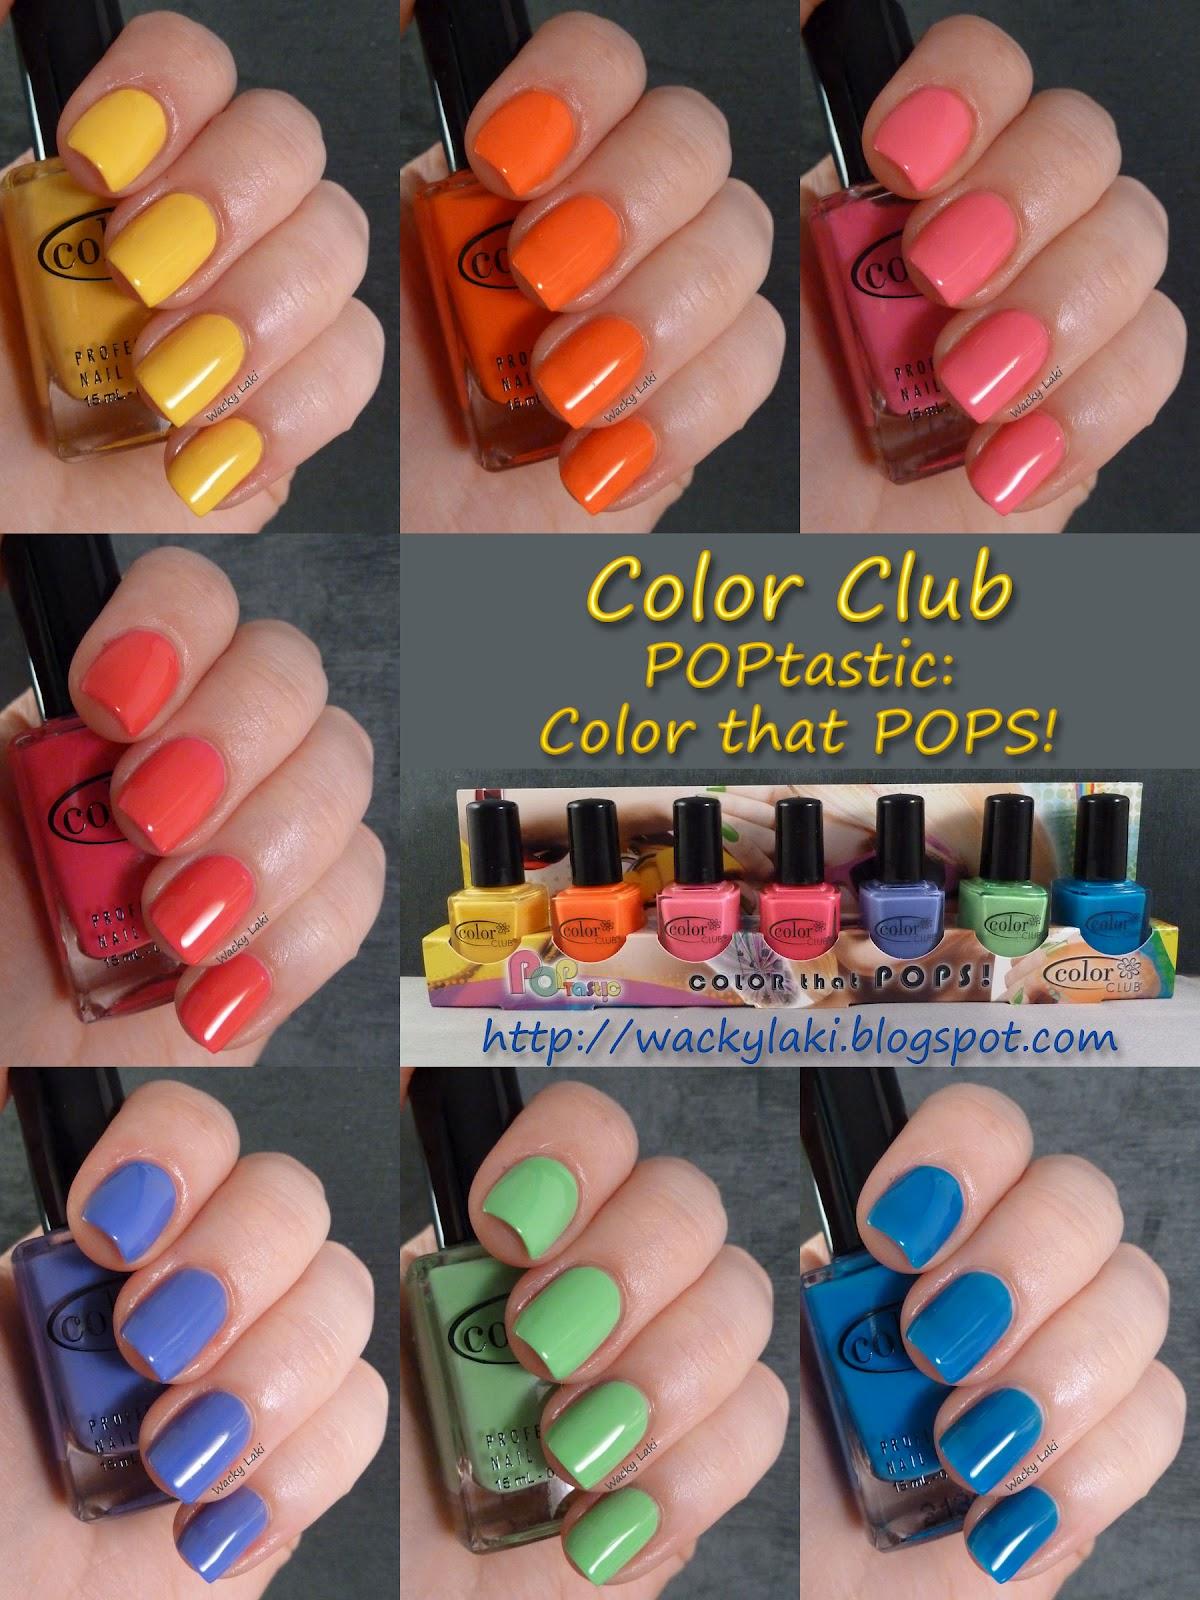 Wacky Laki: Color Club POPtastic: Color that POPS!